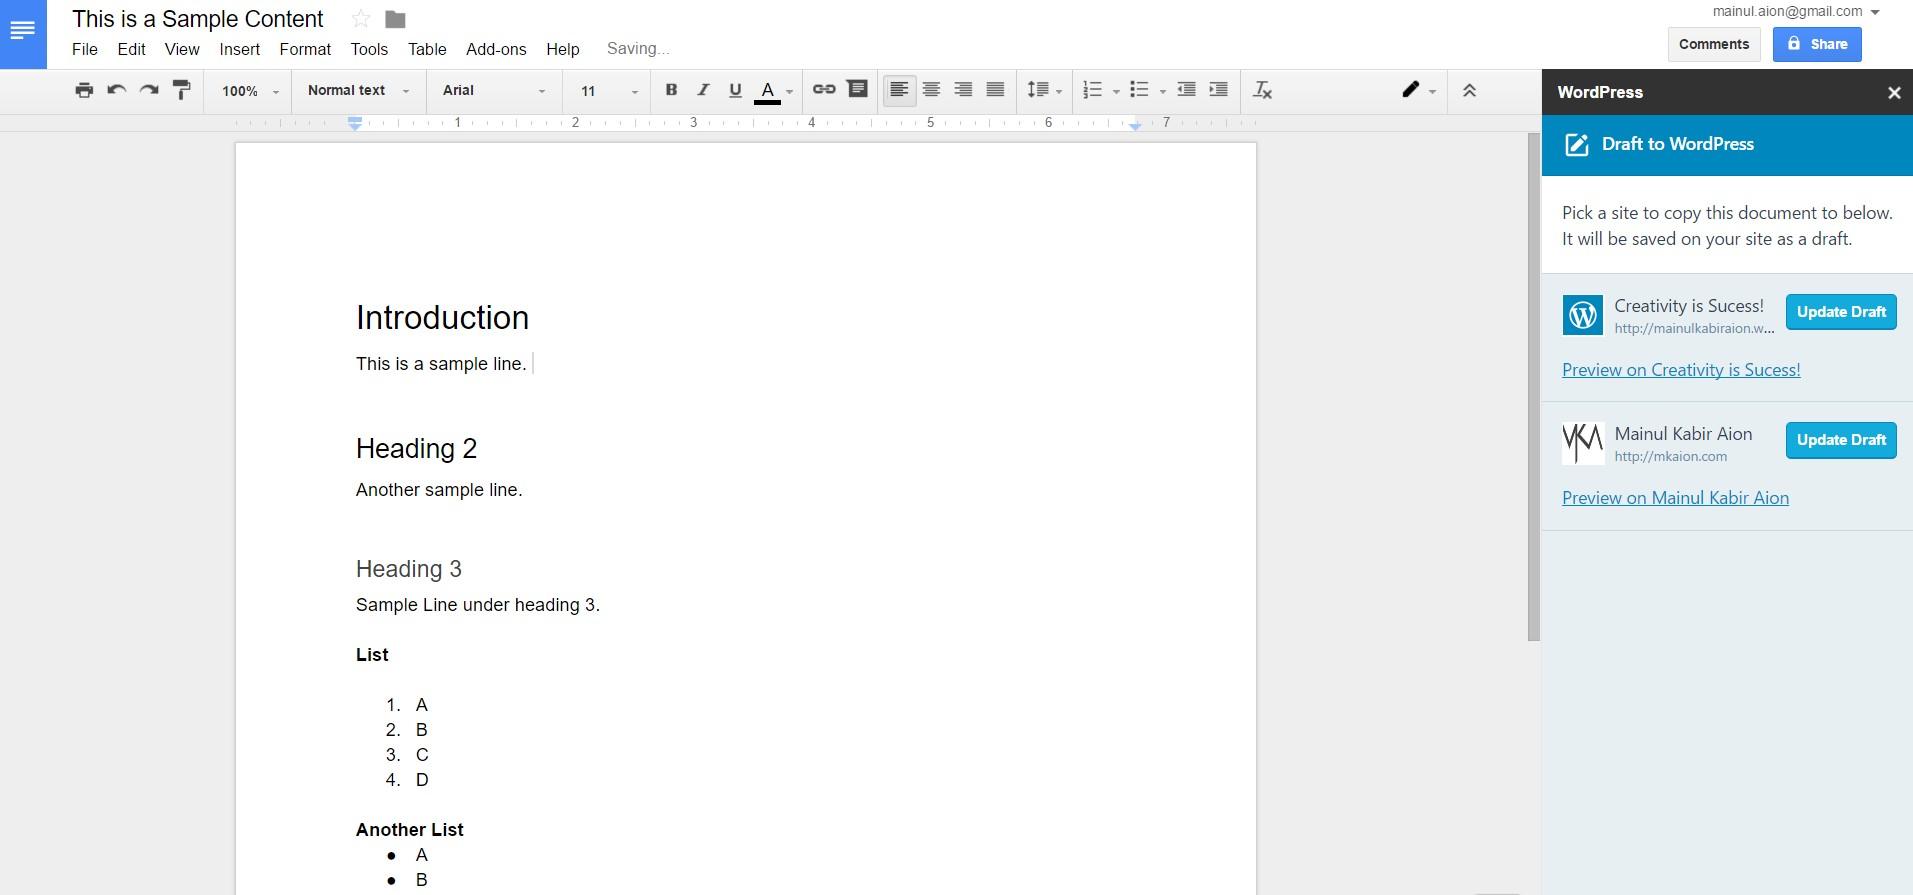 Tutorial] How-To Save Google Docs Drafts as WordPress Posts